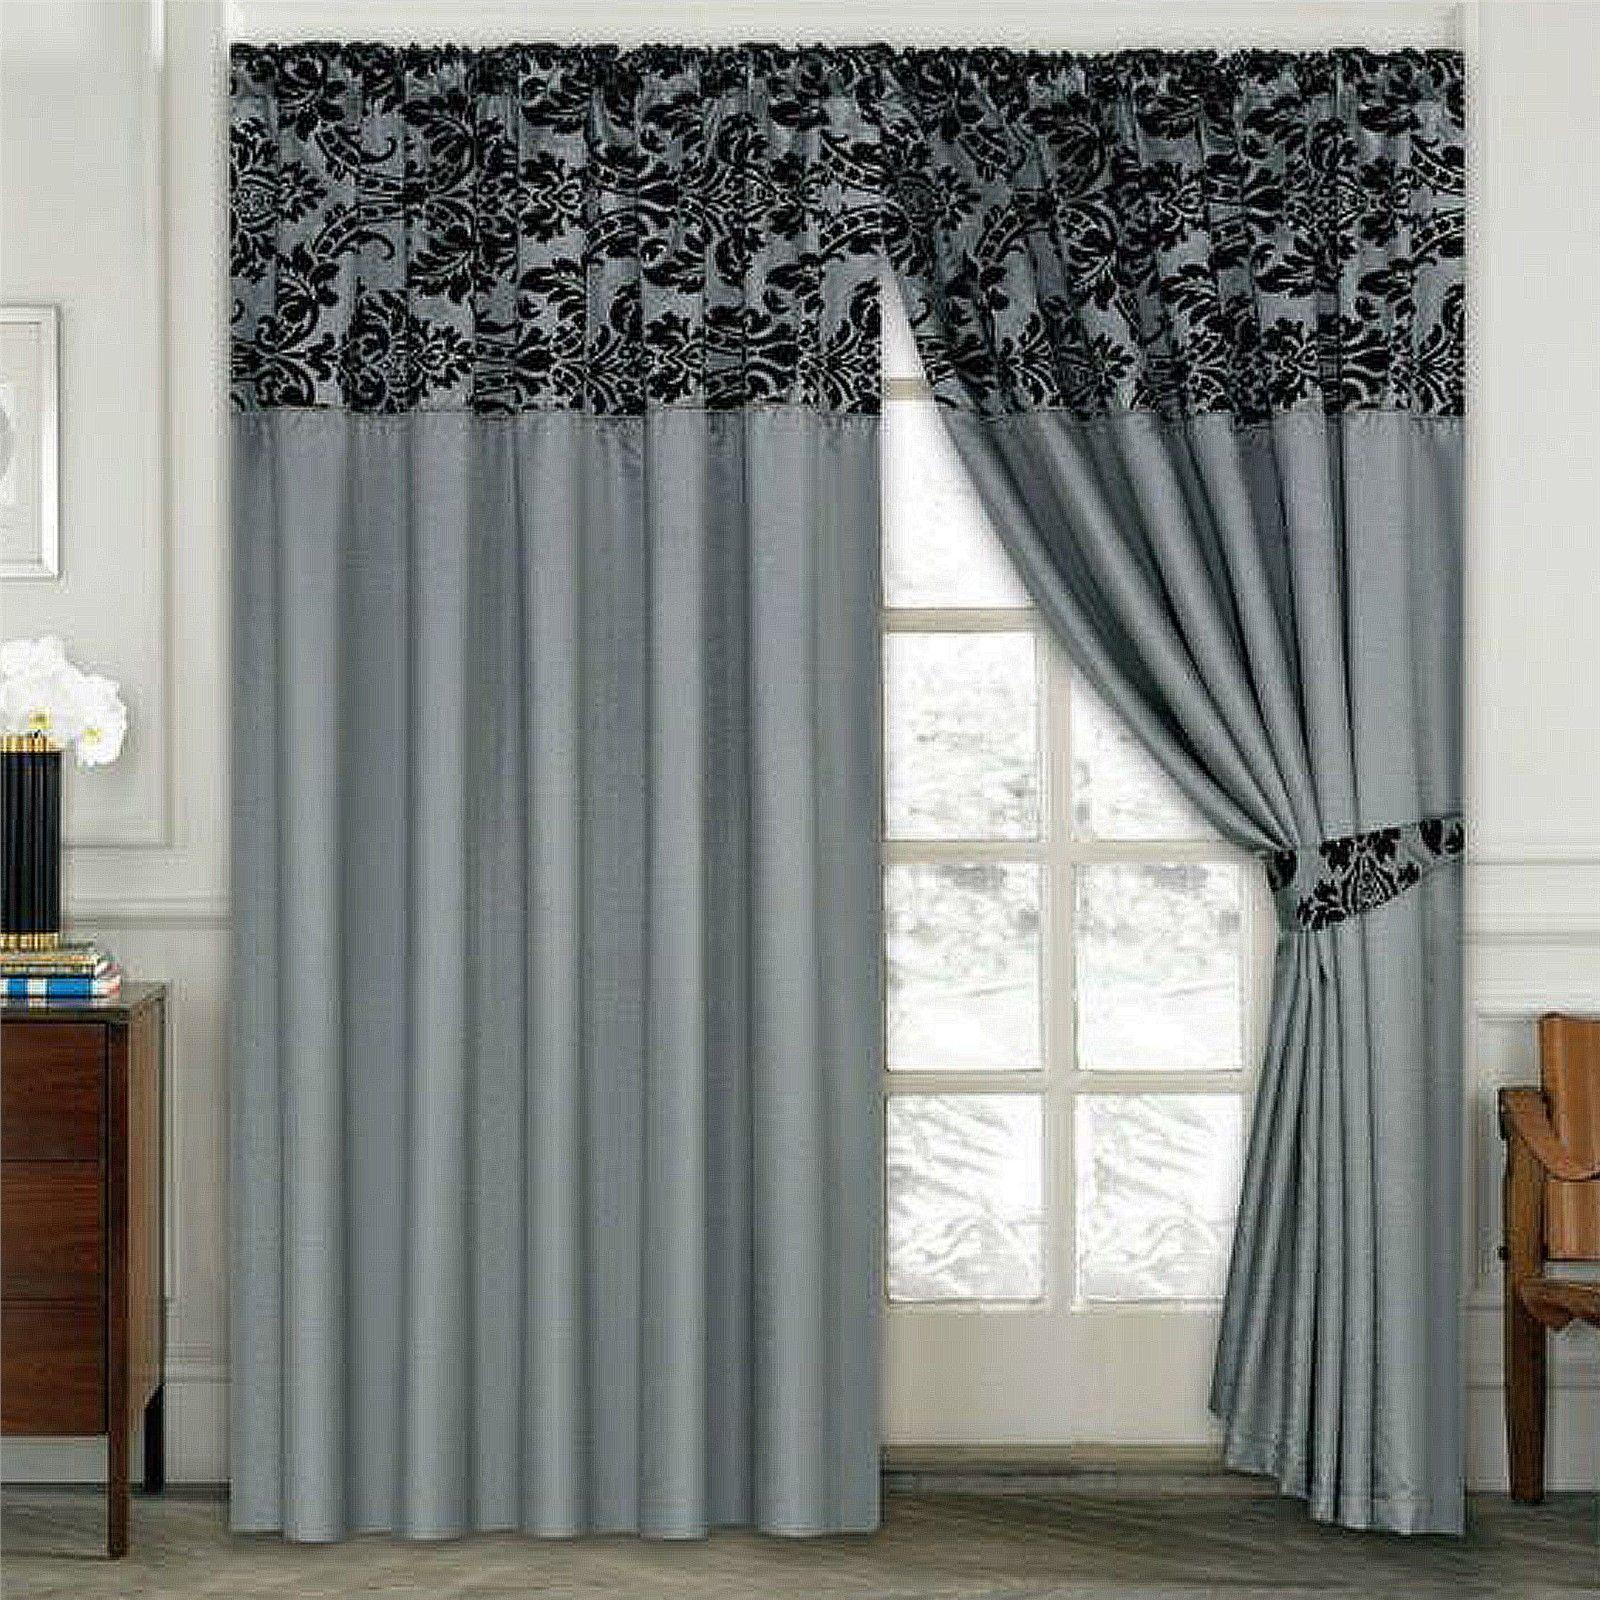 Luxury window coverings  luxury damask curtains pair of half flock pencil pleat window